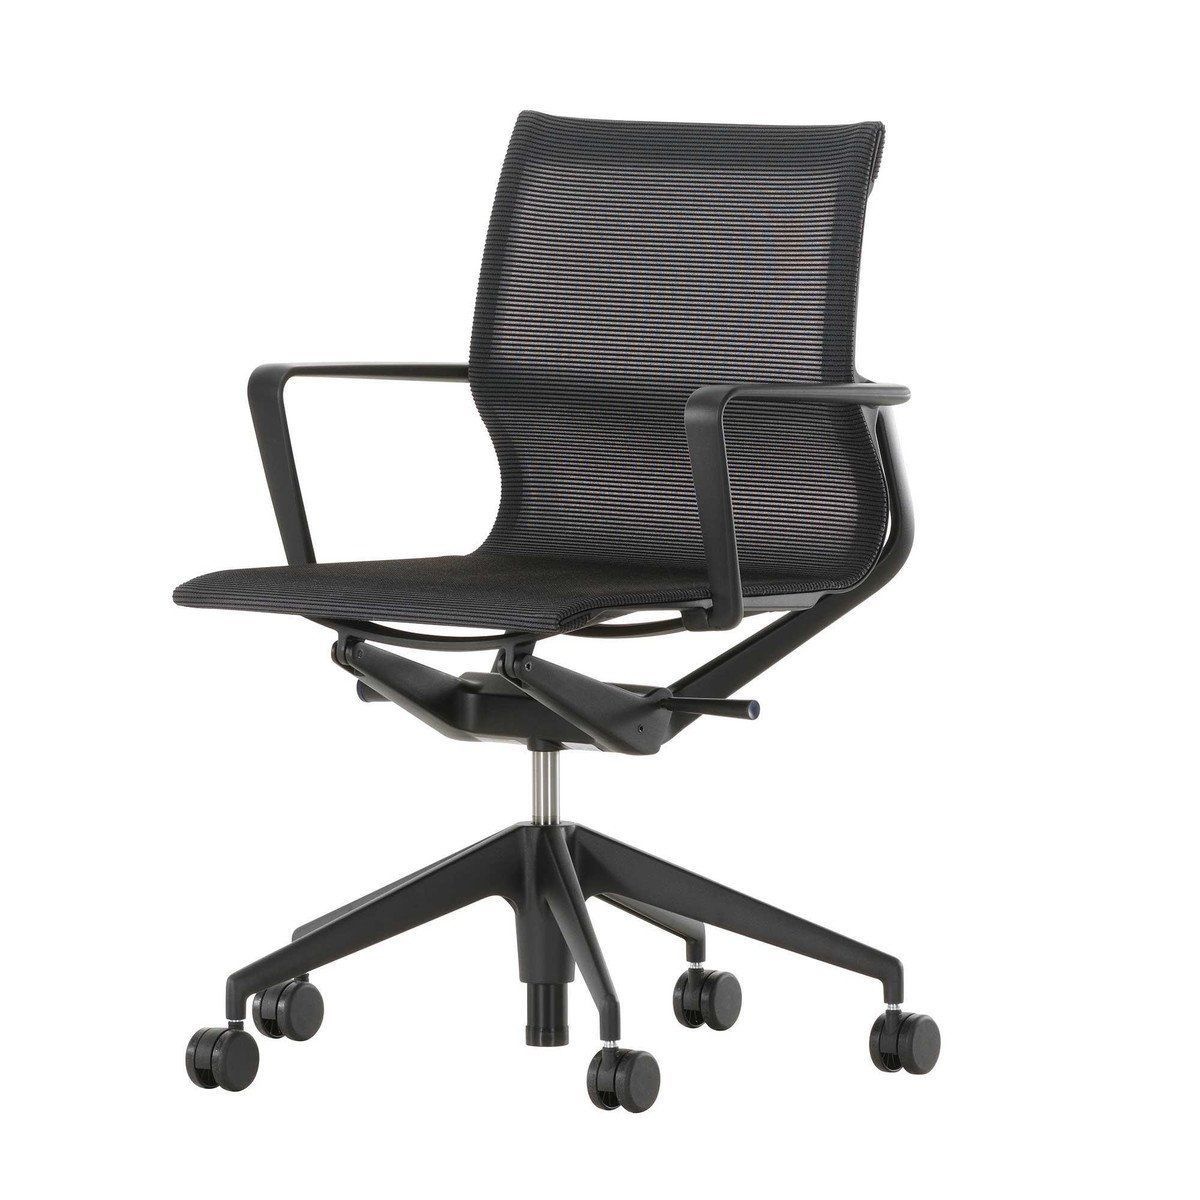 vitra office chair price venus pedicure physix meda ambientedirect